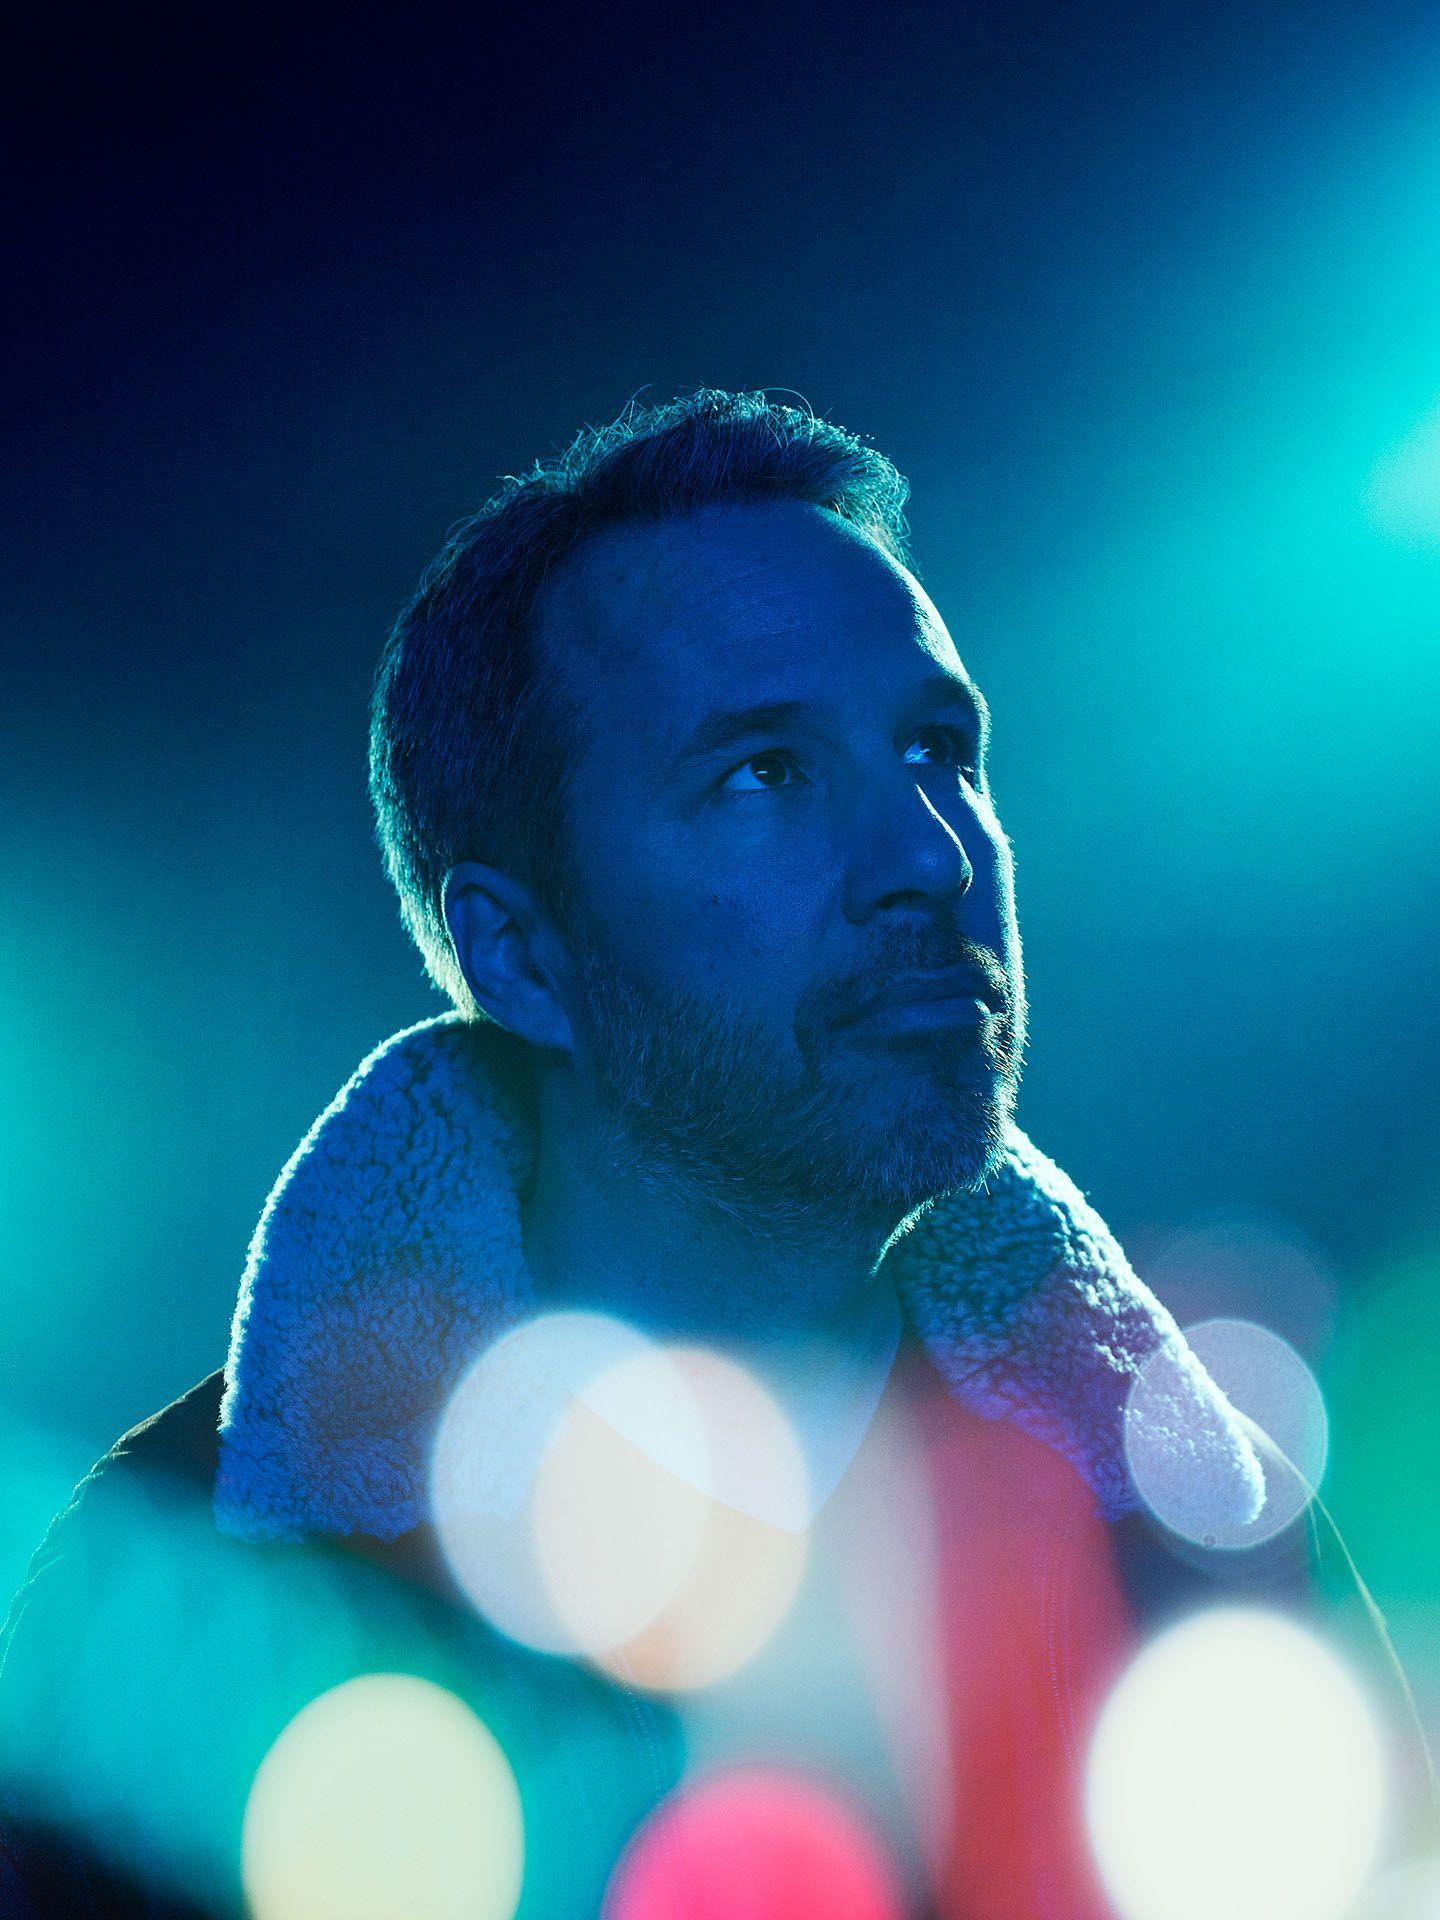 portrait of Denis Villeneuve in blue lighting on blue background and bokeh effect by Jocelyn Michel for Voir